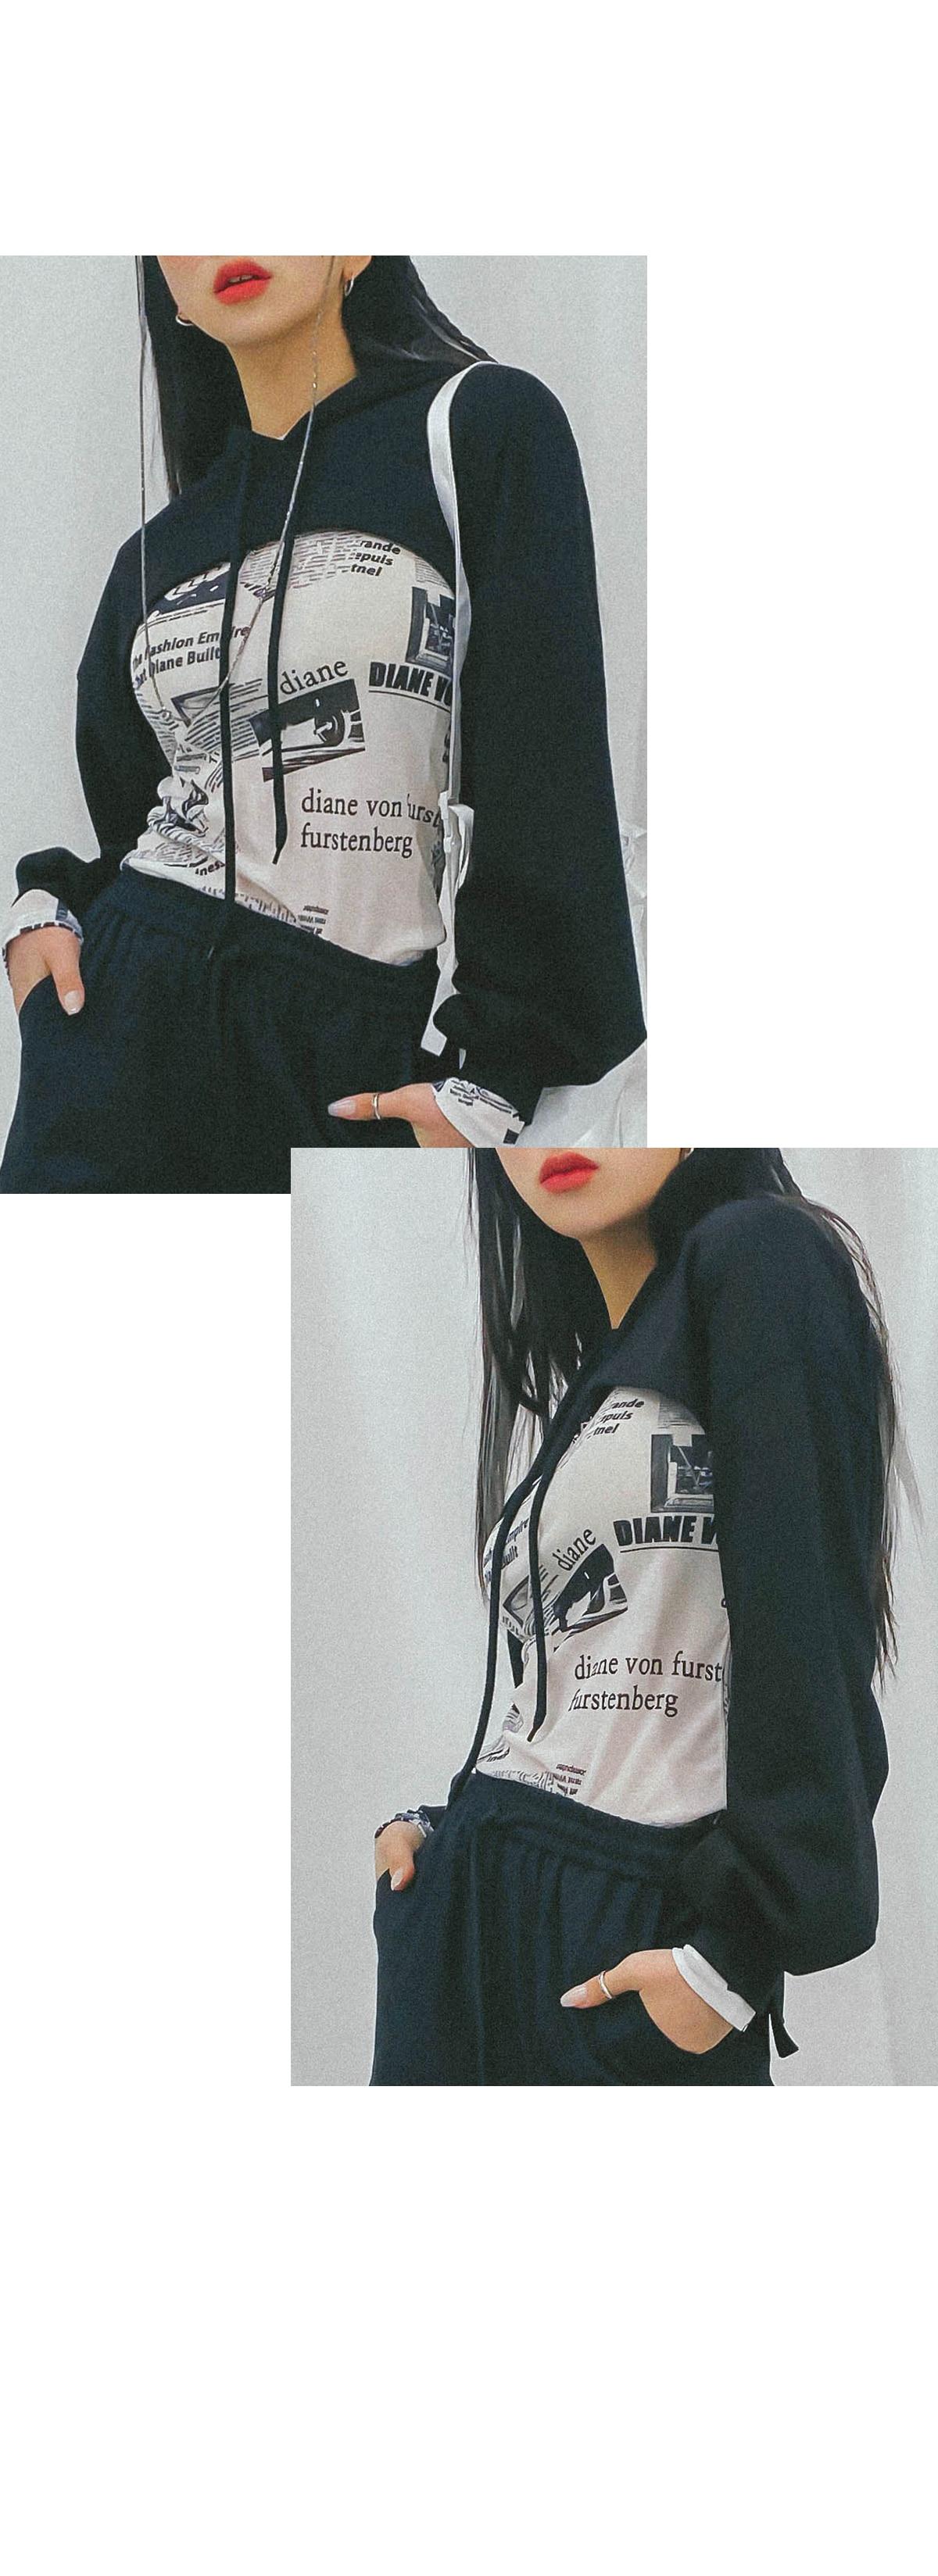 Paper loco T-shirt